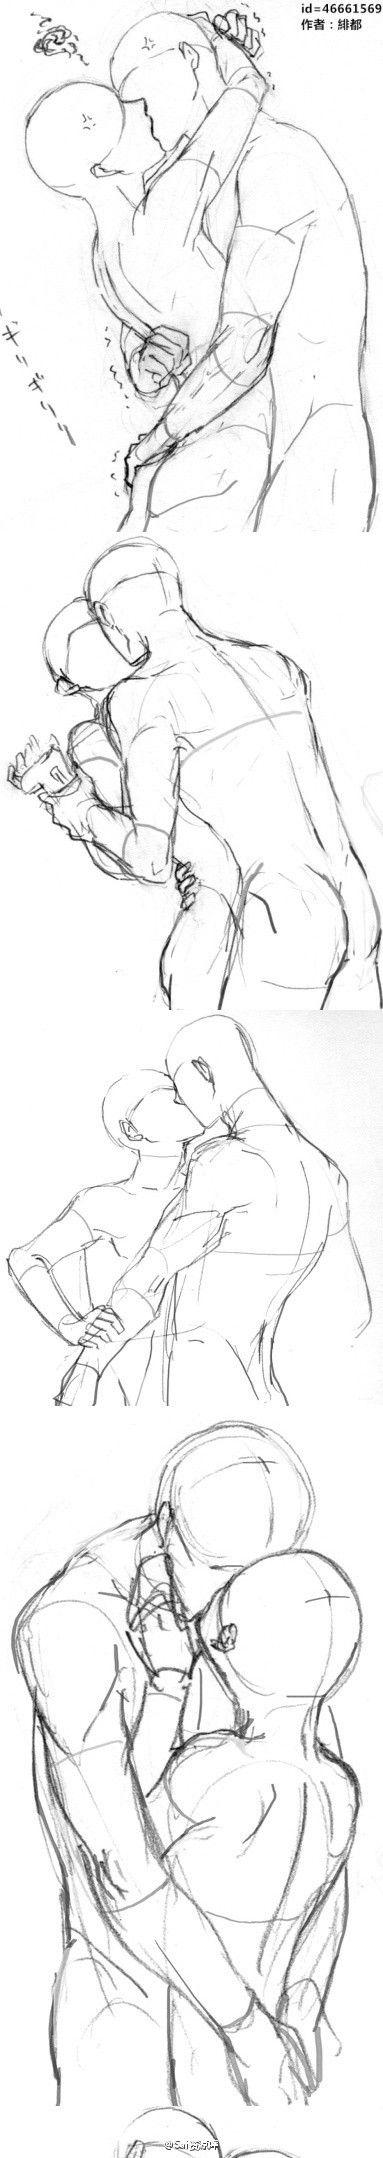 Drawn kisses reference La de #SAI retrato Drawing